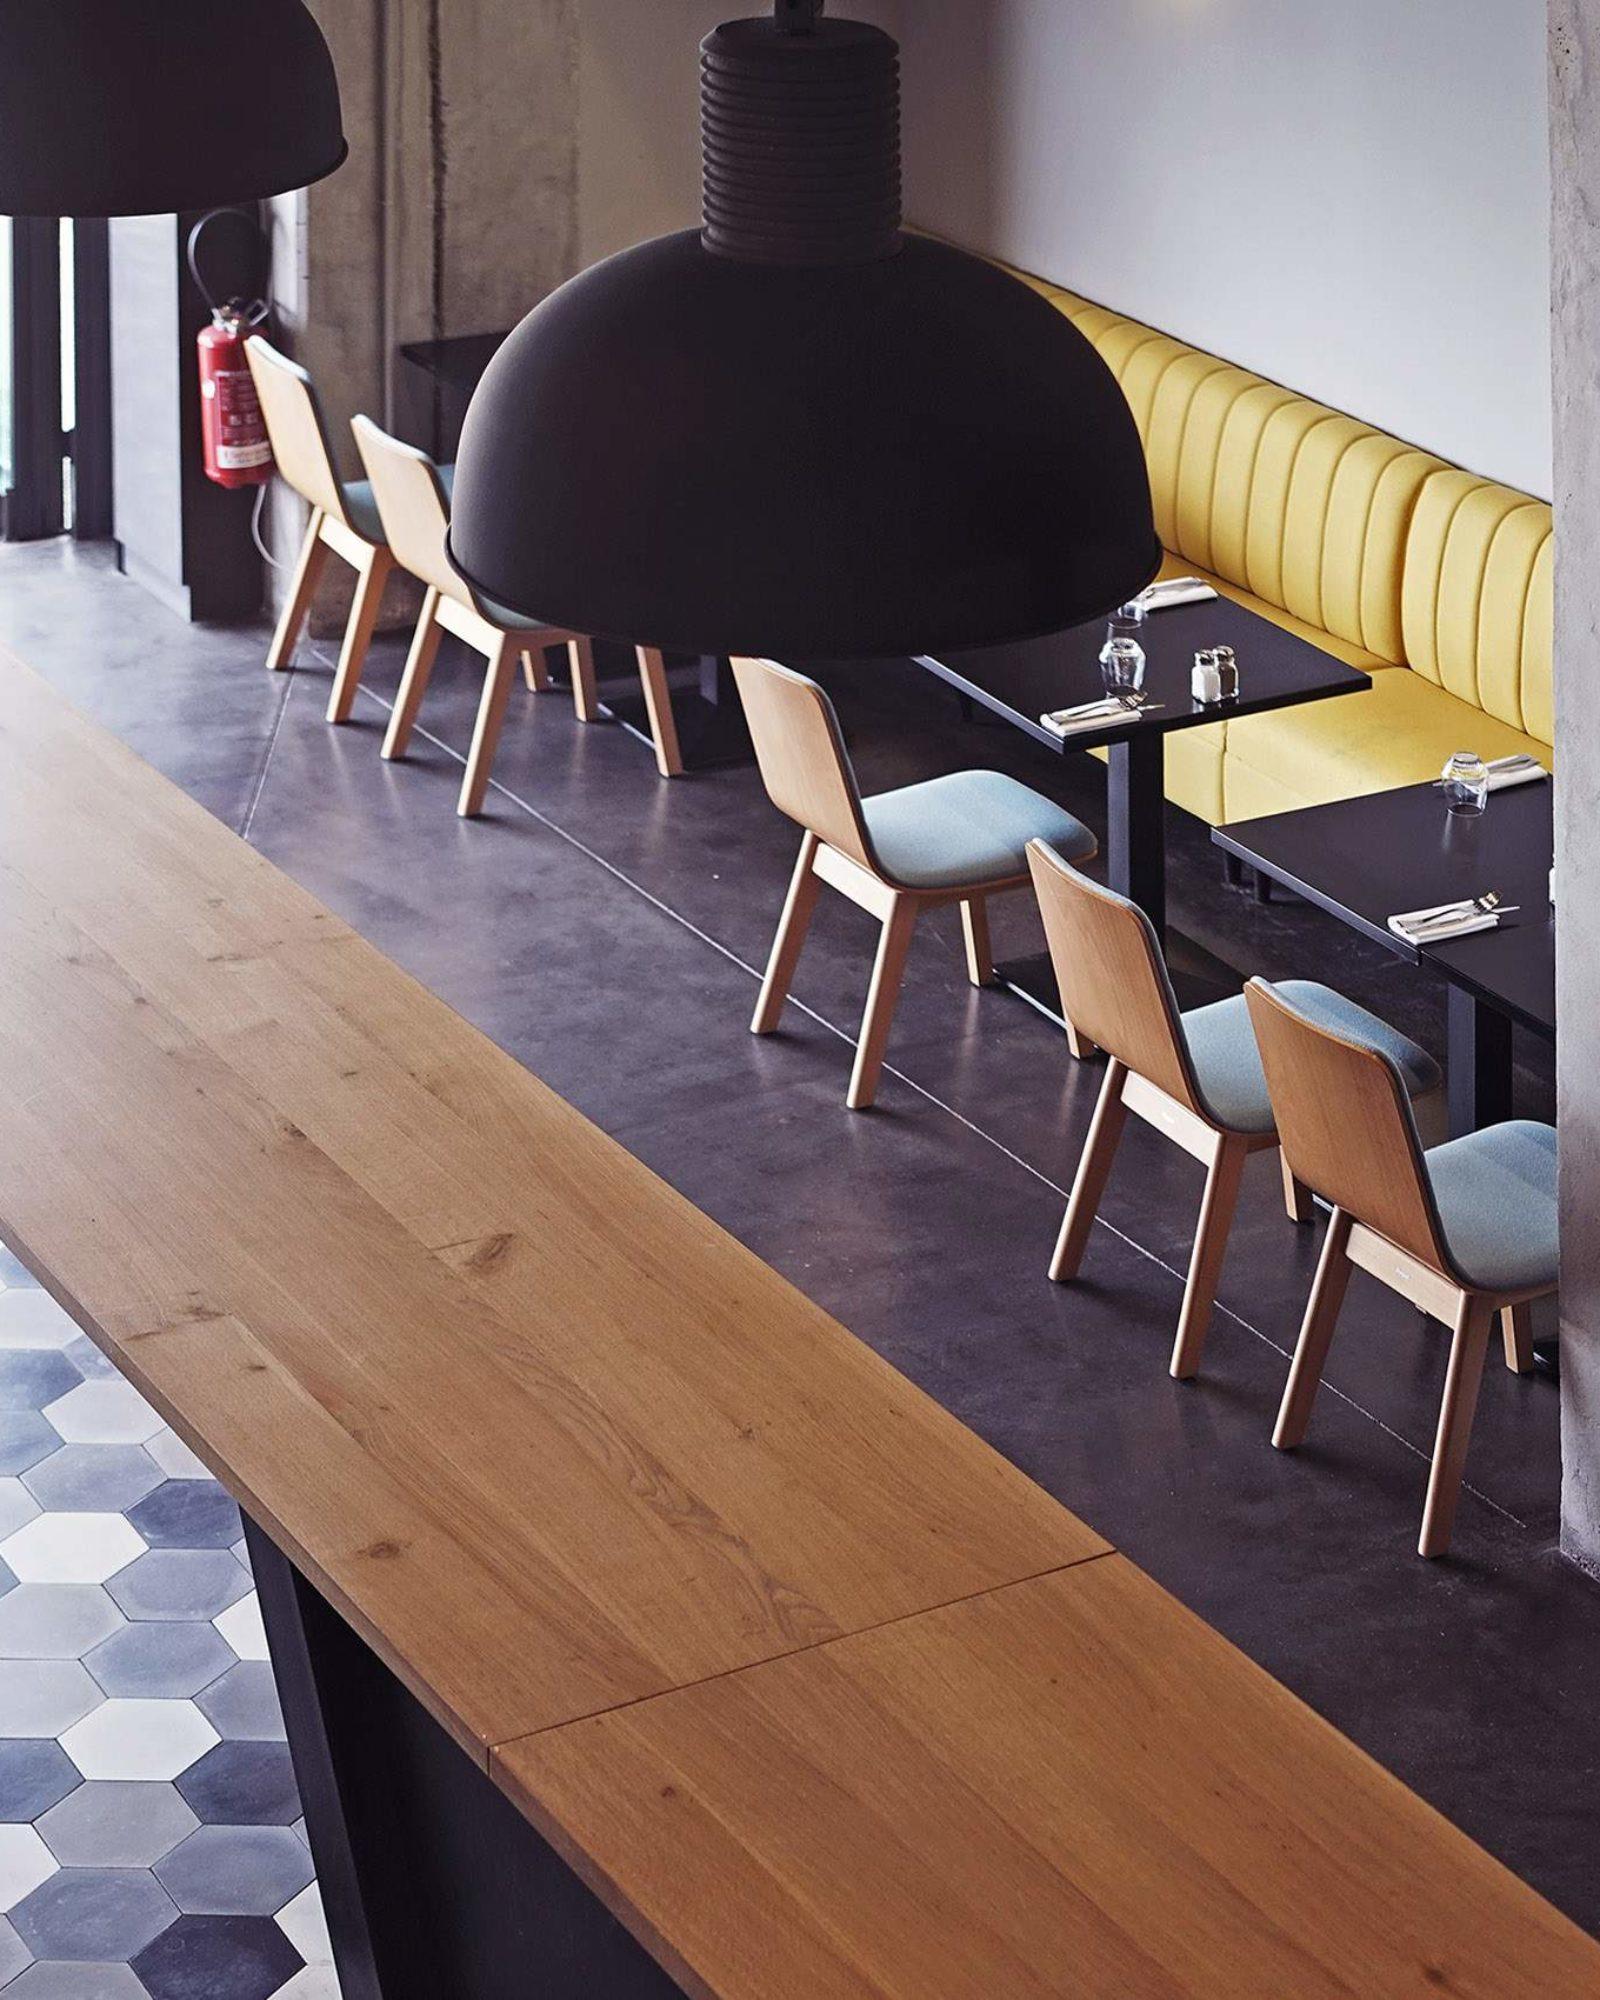 blog_restaurant-design-lembarcardere-marseille-12